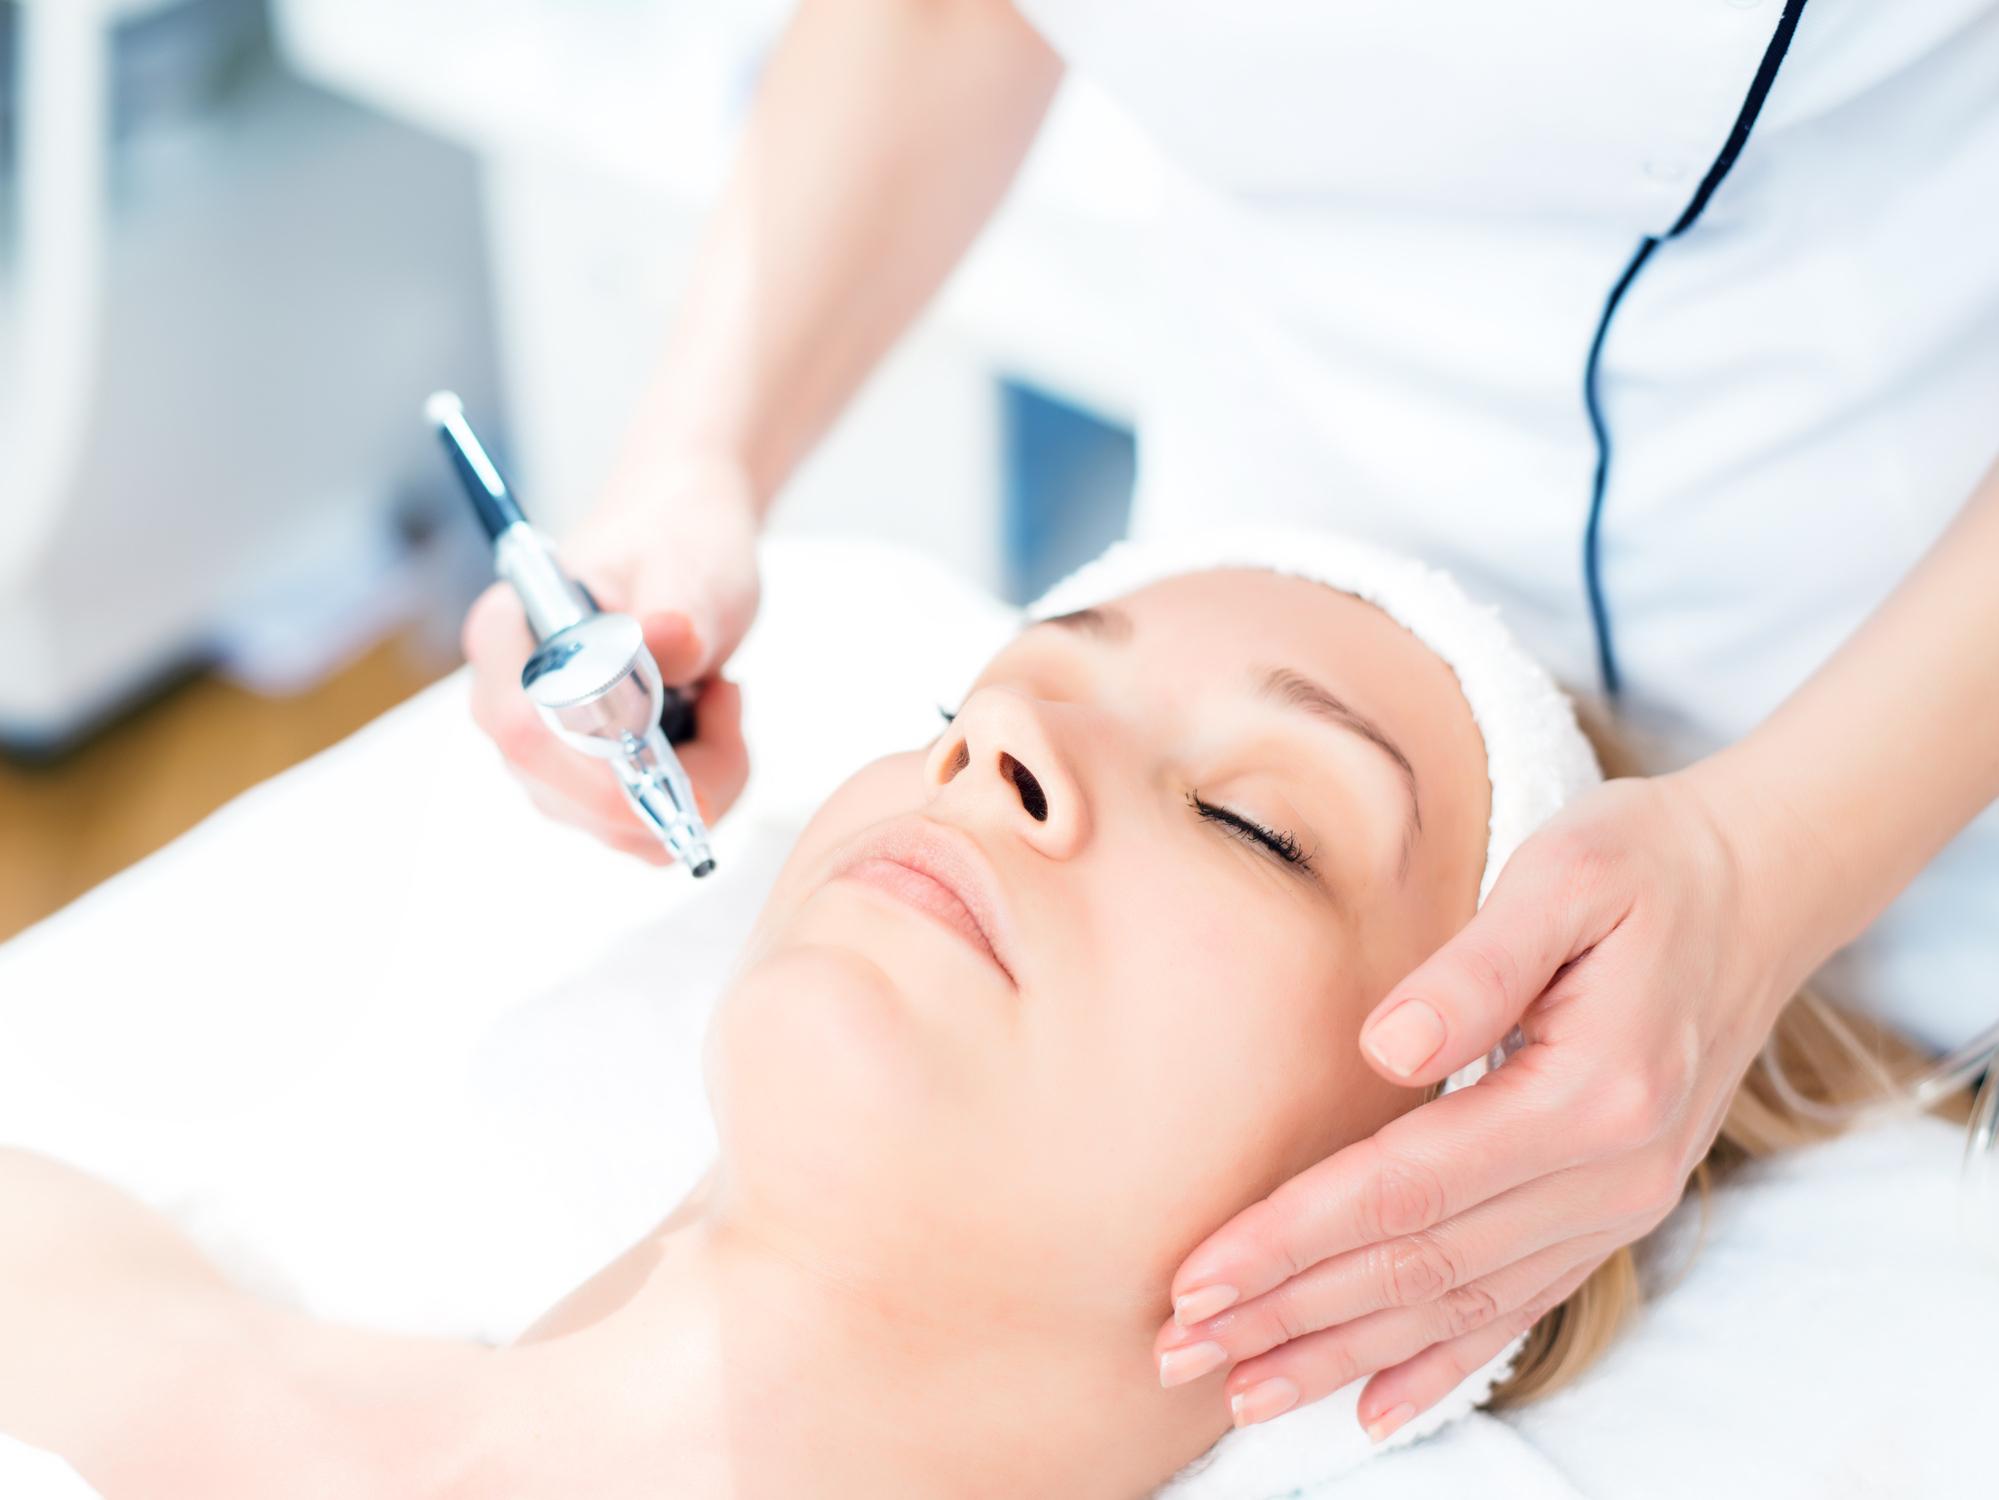 hih oxygen infusion facial istock image.jpg